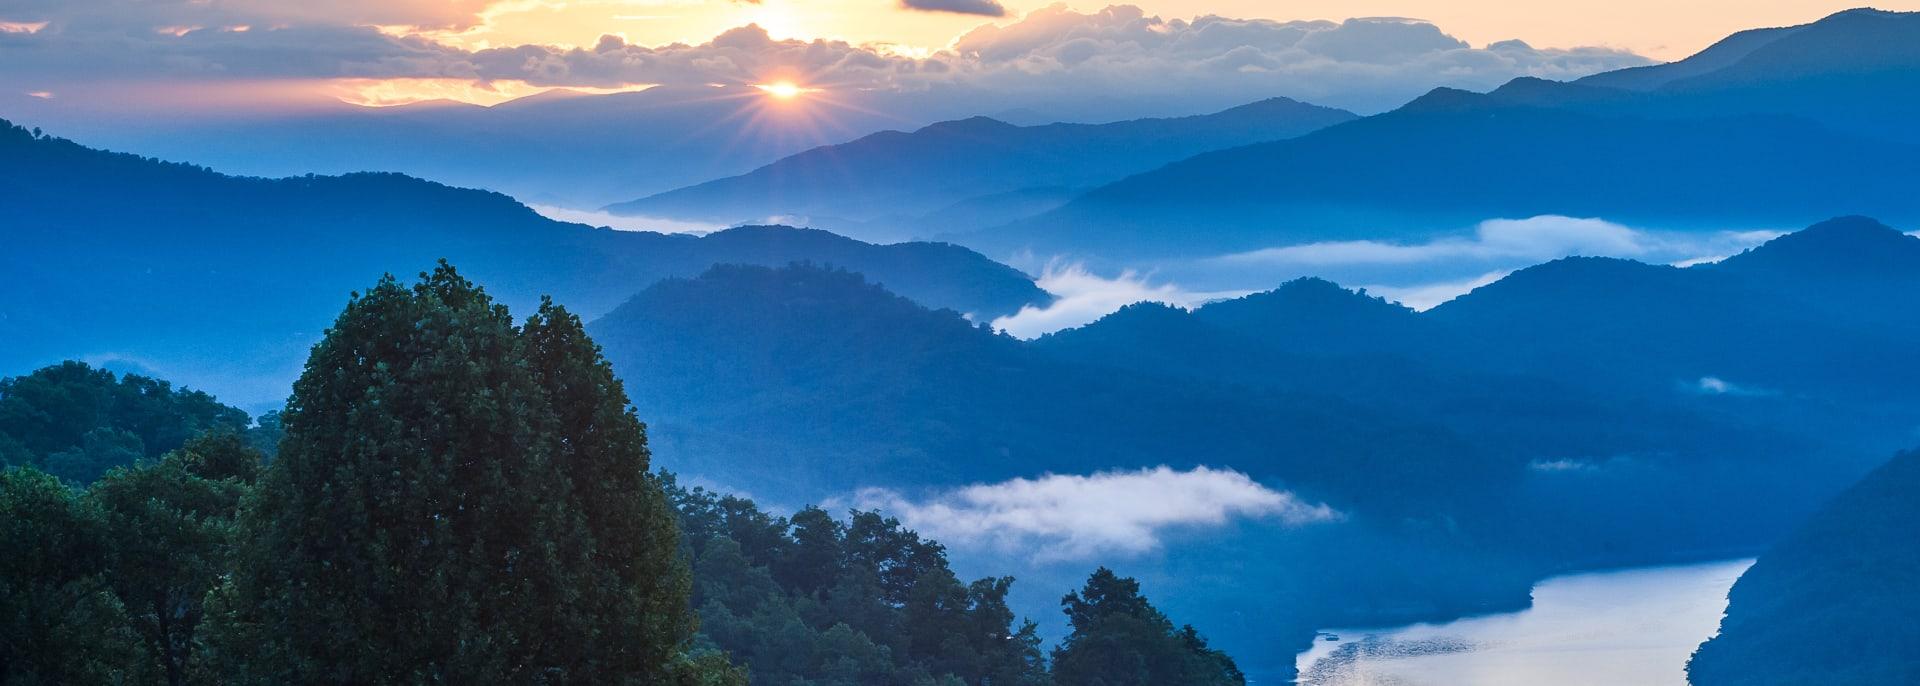 Great Smoky Mountains National Park, Südstaaten, USA